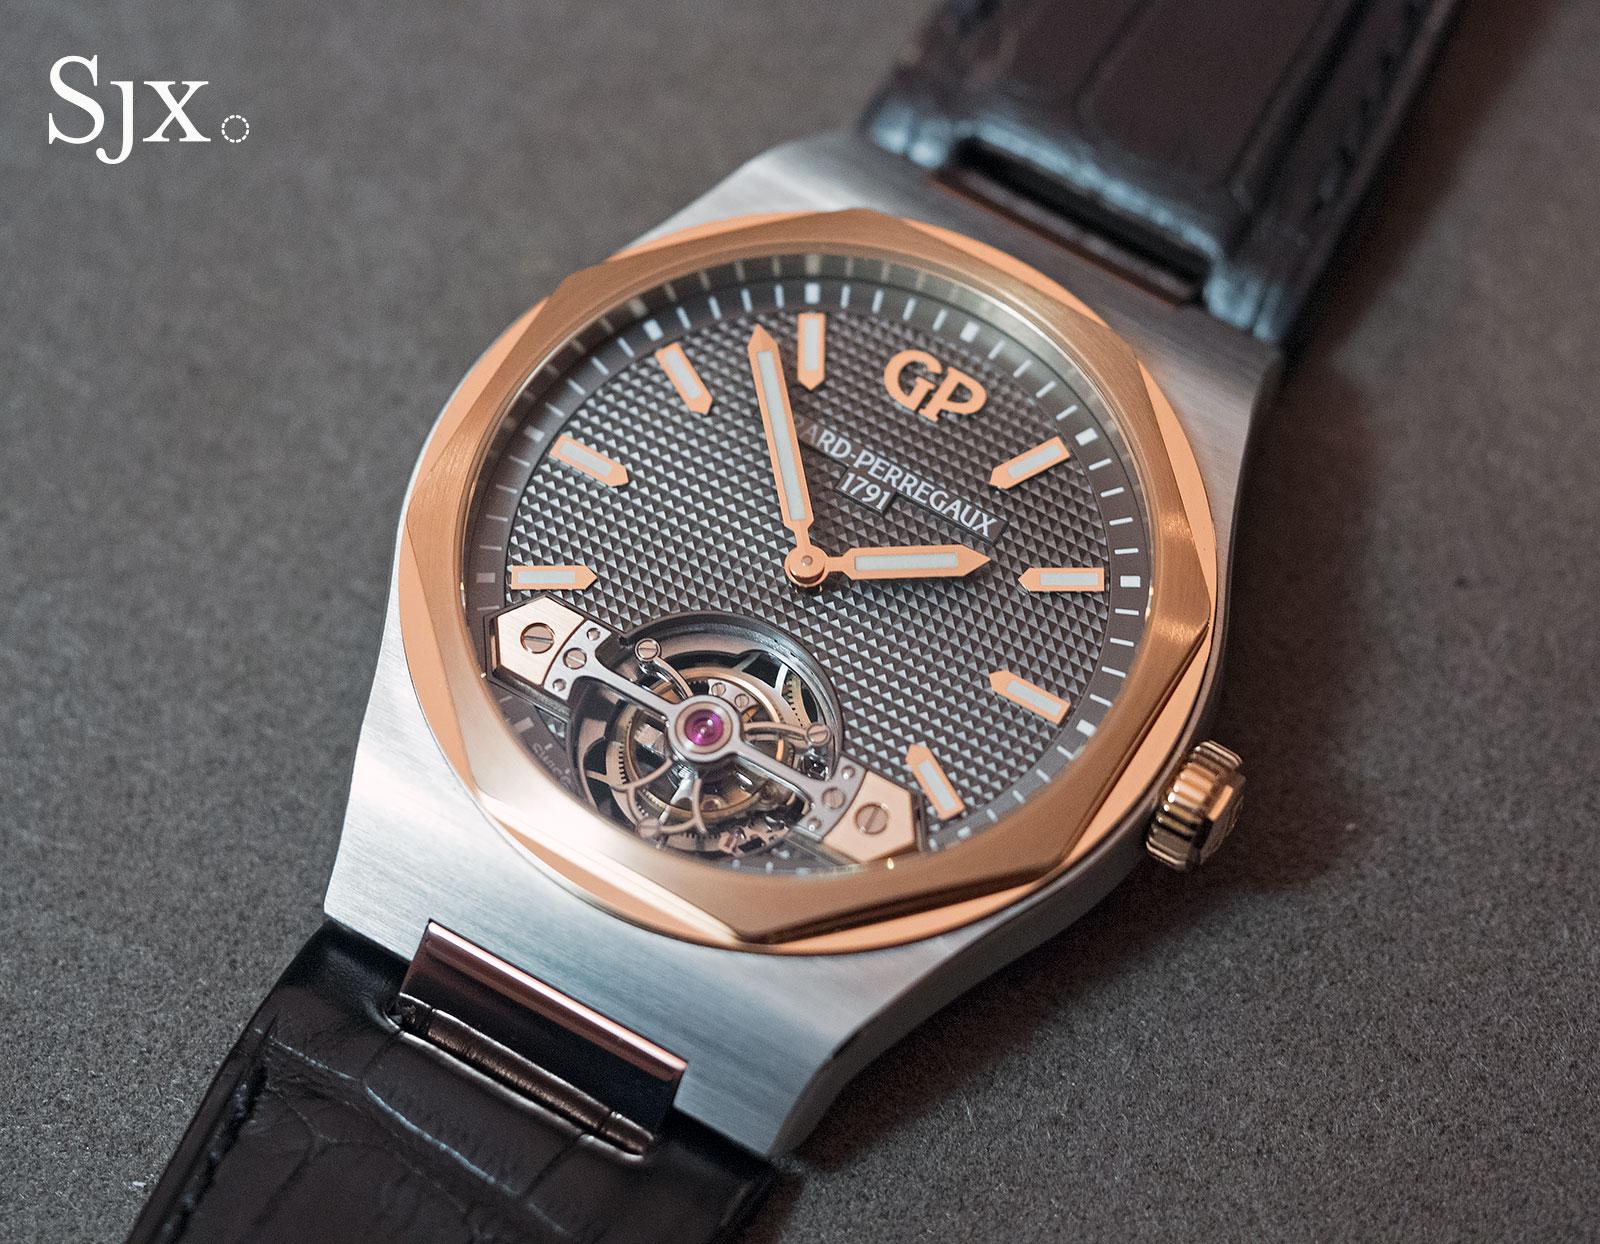 Girard-Perregaux Laureato Tourbillon titanium 5